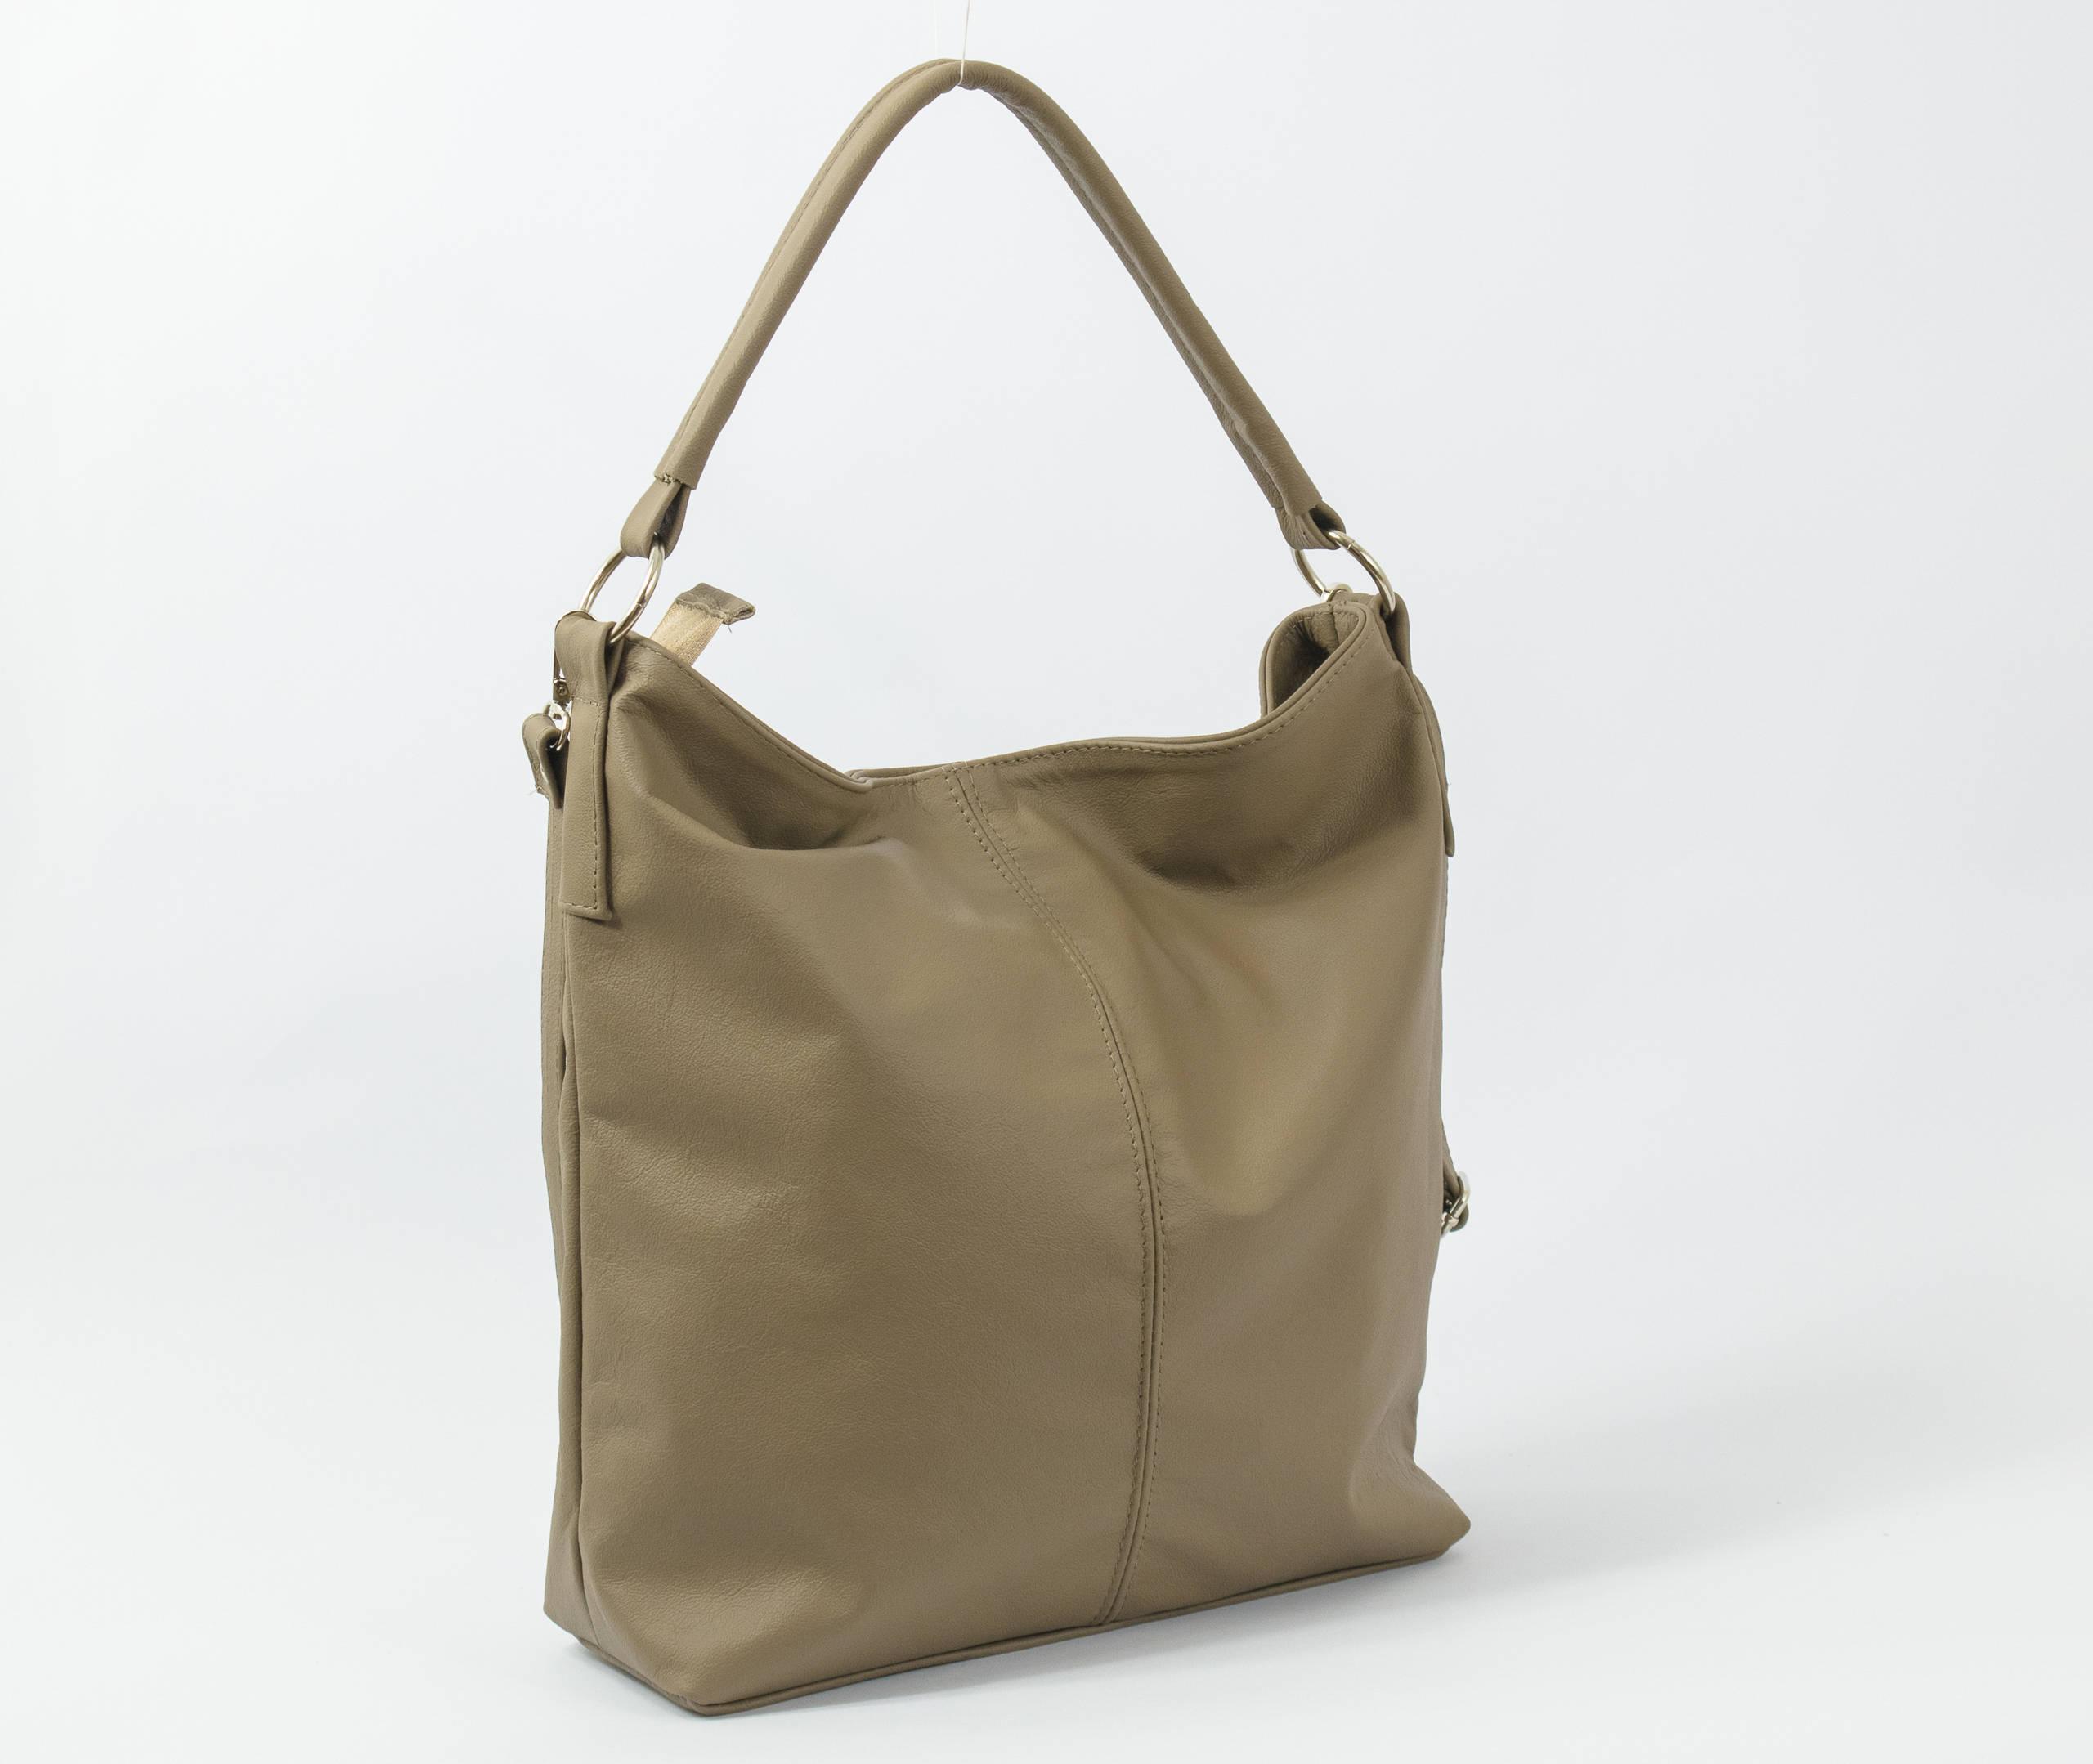 LEATHER HOBO BAG Coffee Leather Handbag Everyday Tote Bag  f814e4d36c613